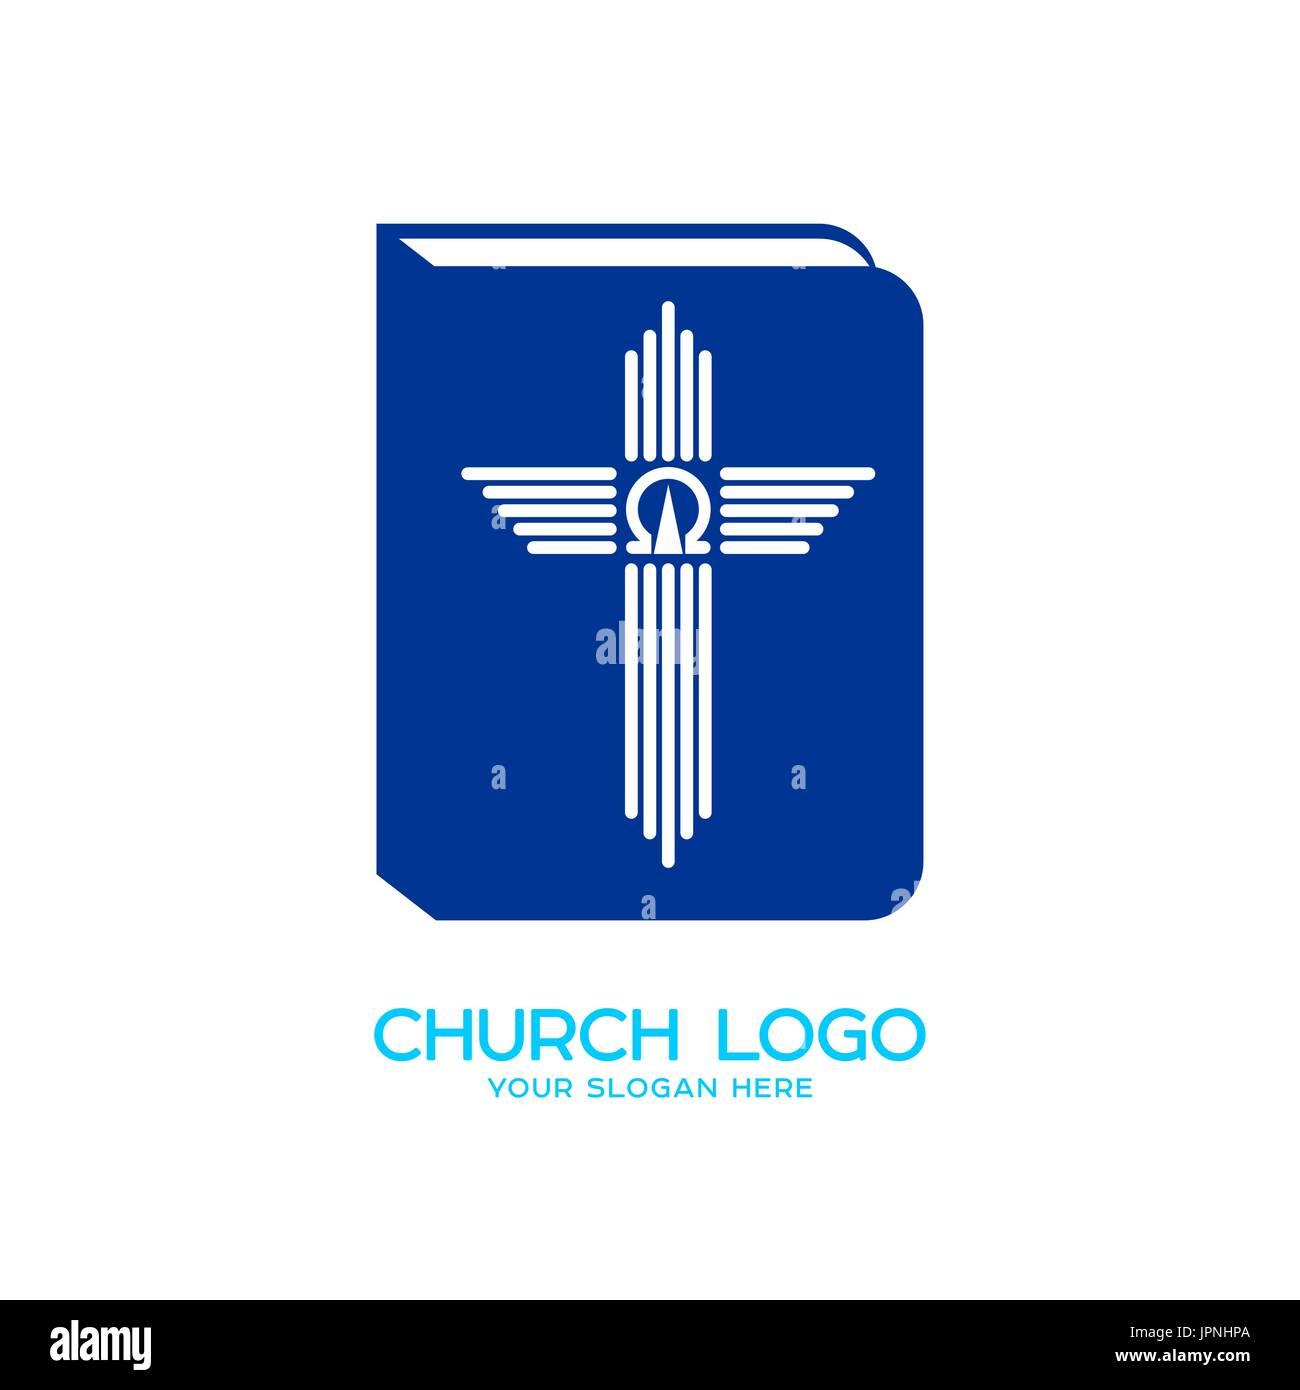 Church Logo Christian Symbols The Bible The Cross And The Symbols